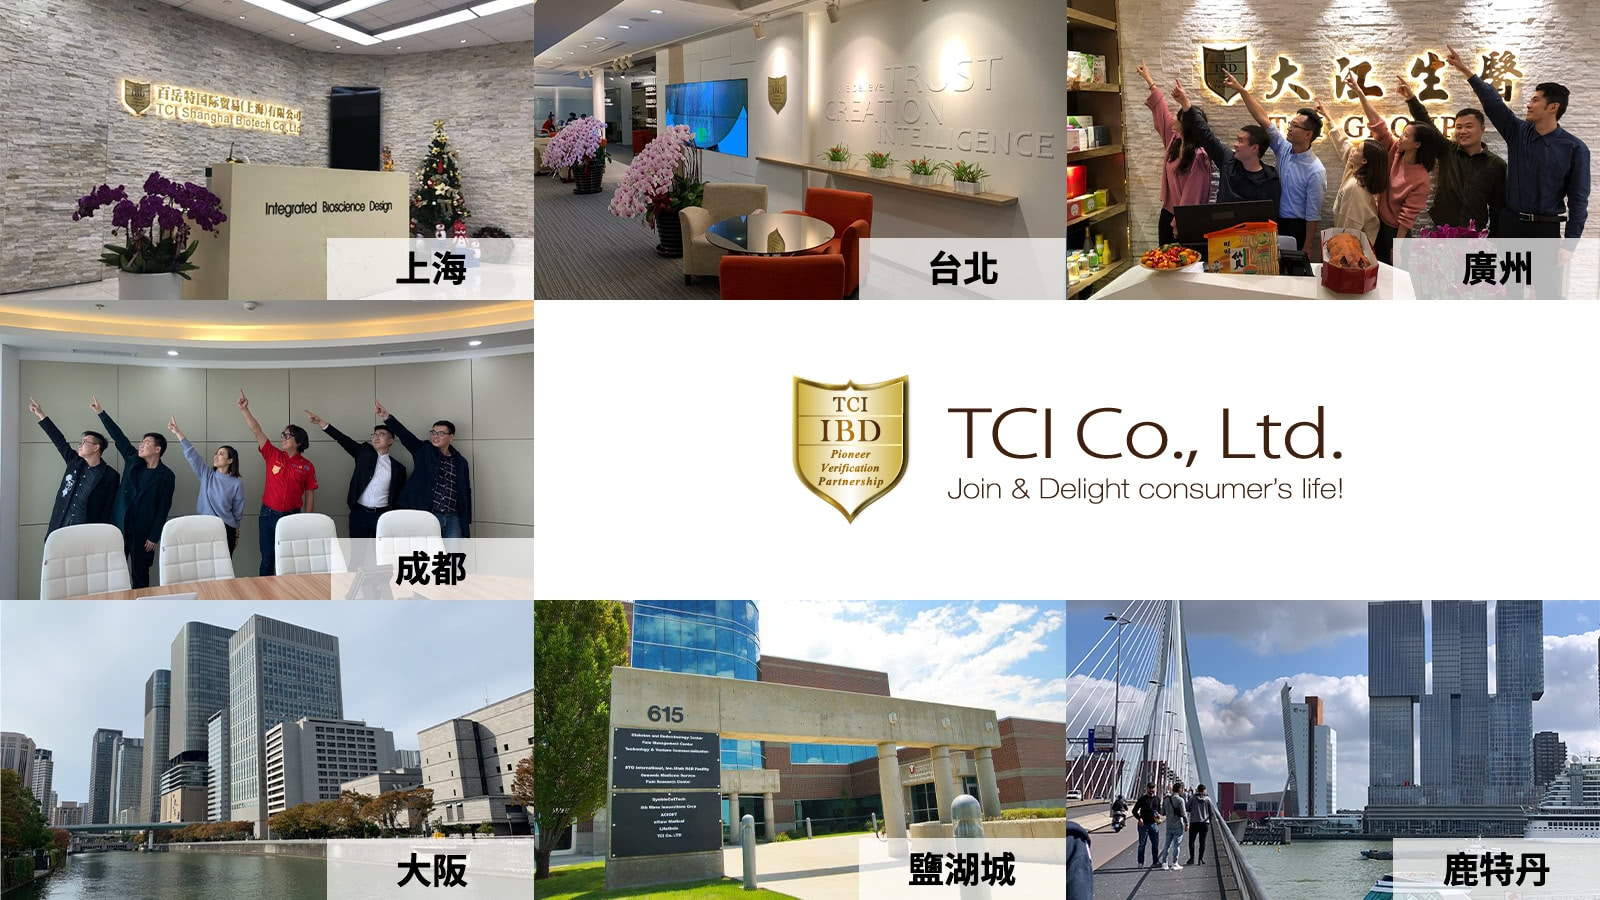 TCI 大江生醫上海,台北,廣州,成都,大阪,鹽湖 城、鹿特丹